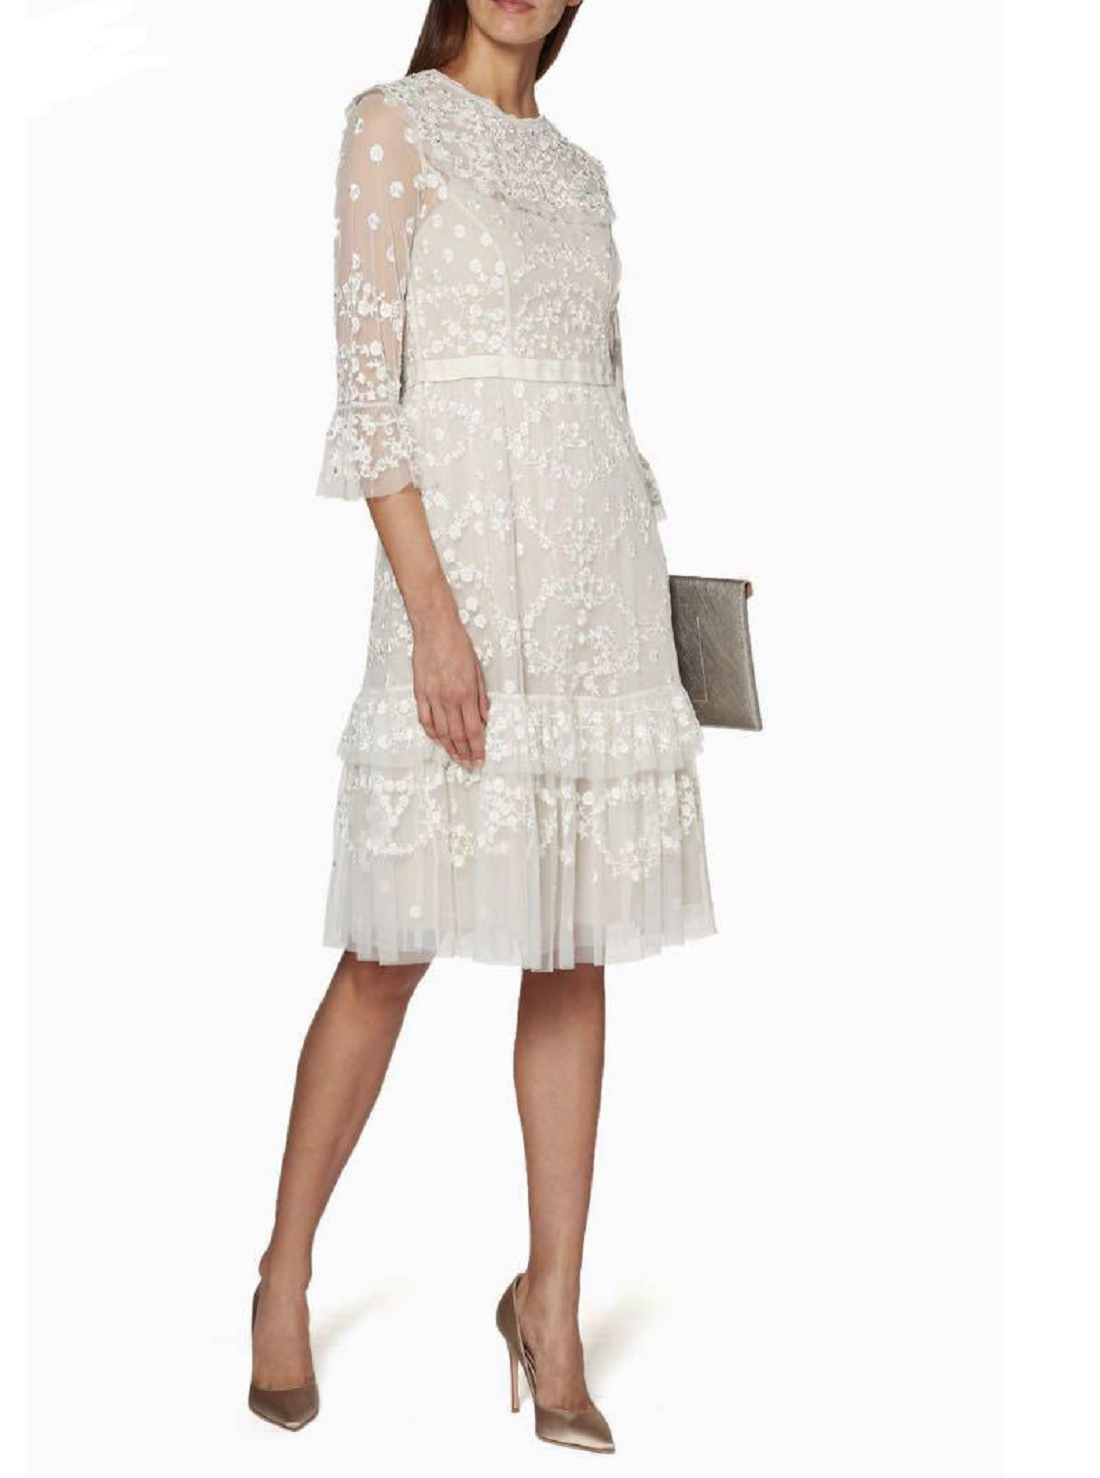 9 Wholesale Long Sleeve Lace Dresses